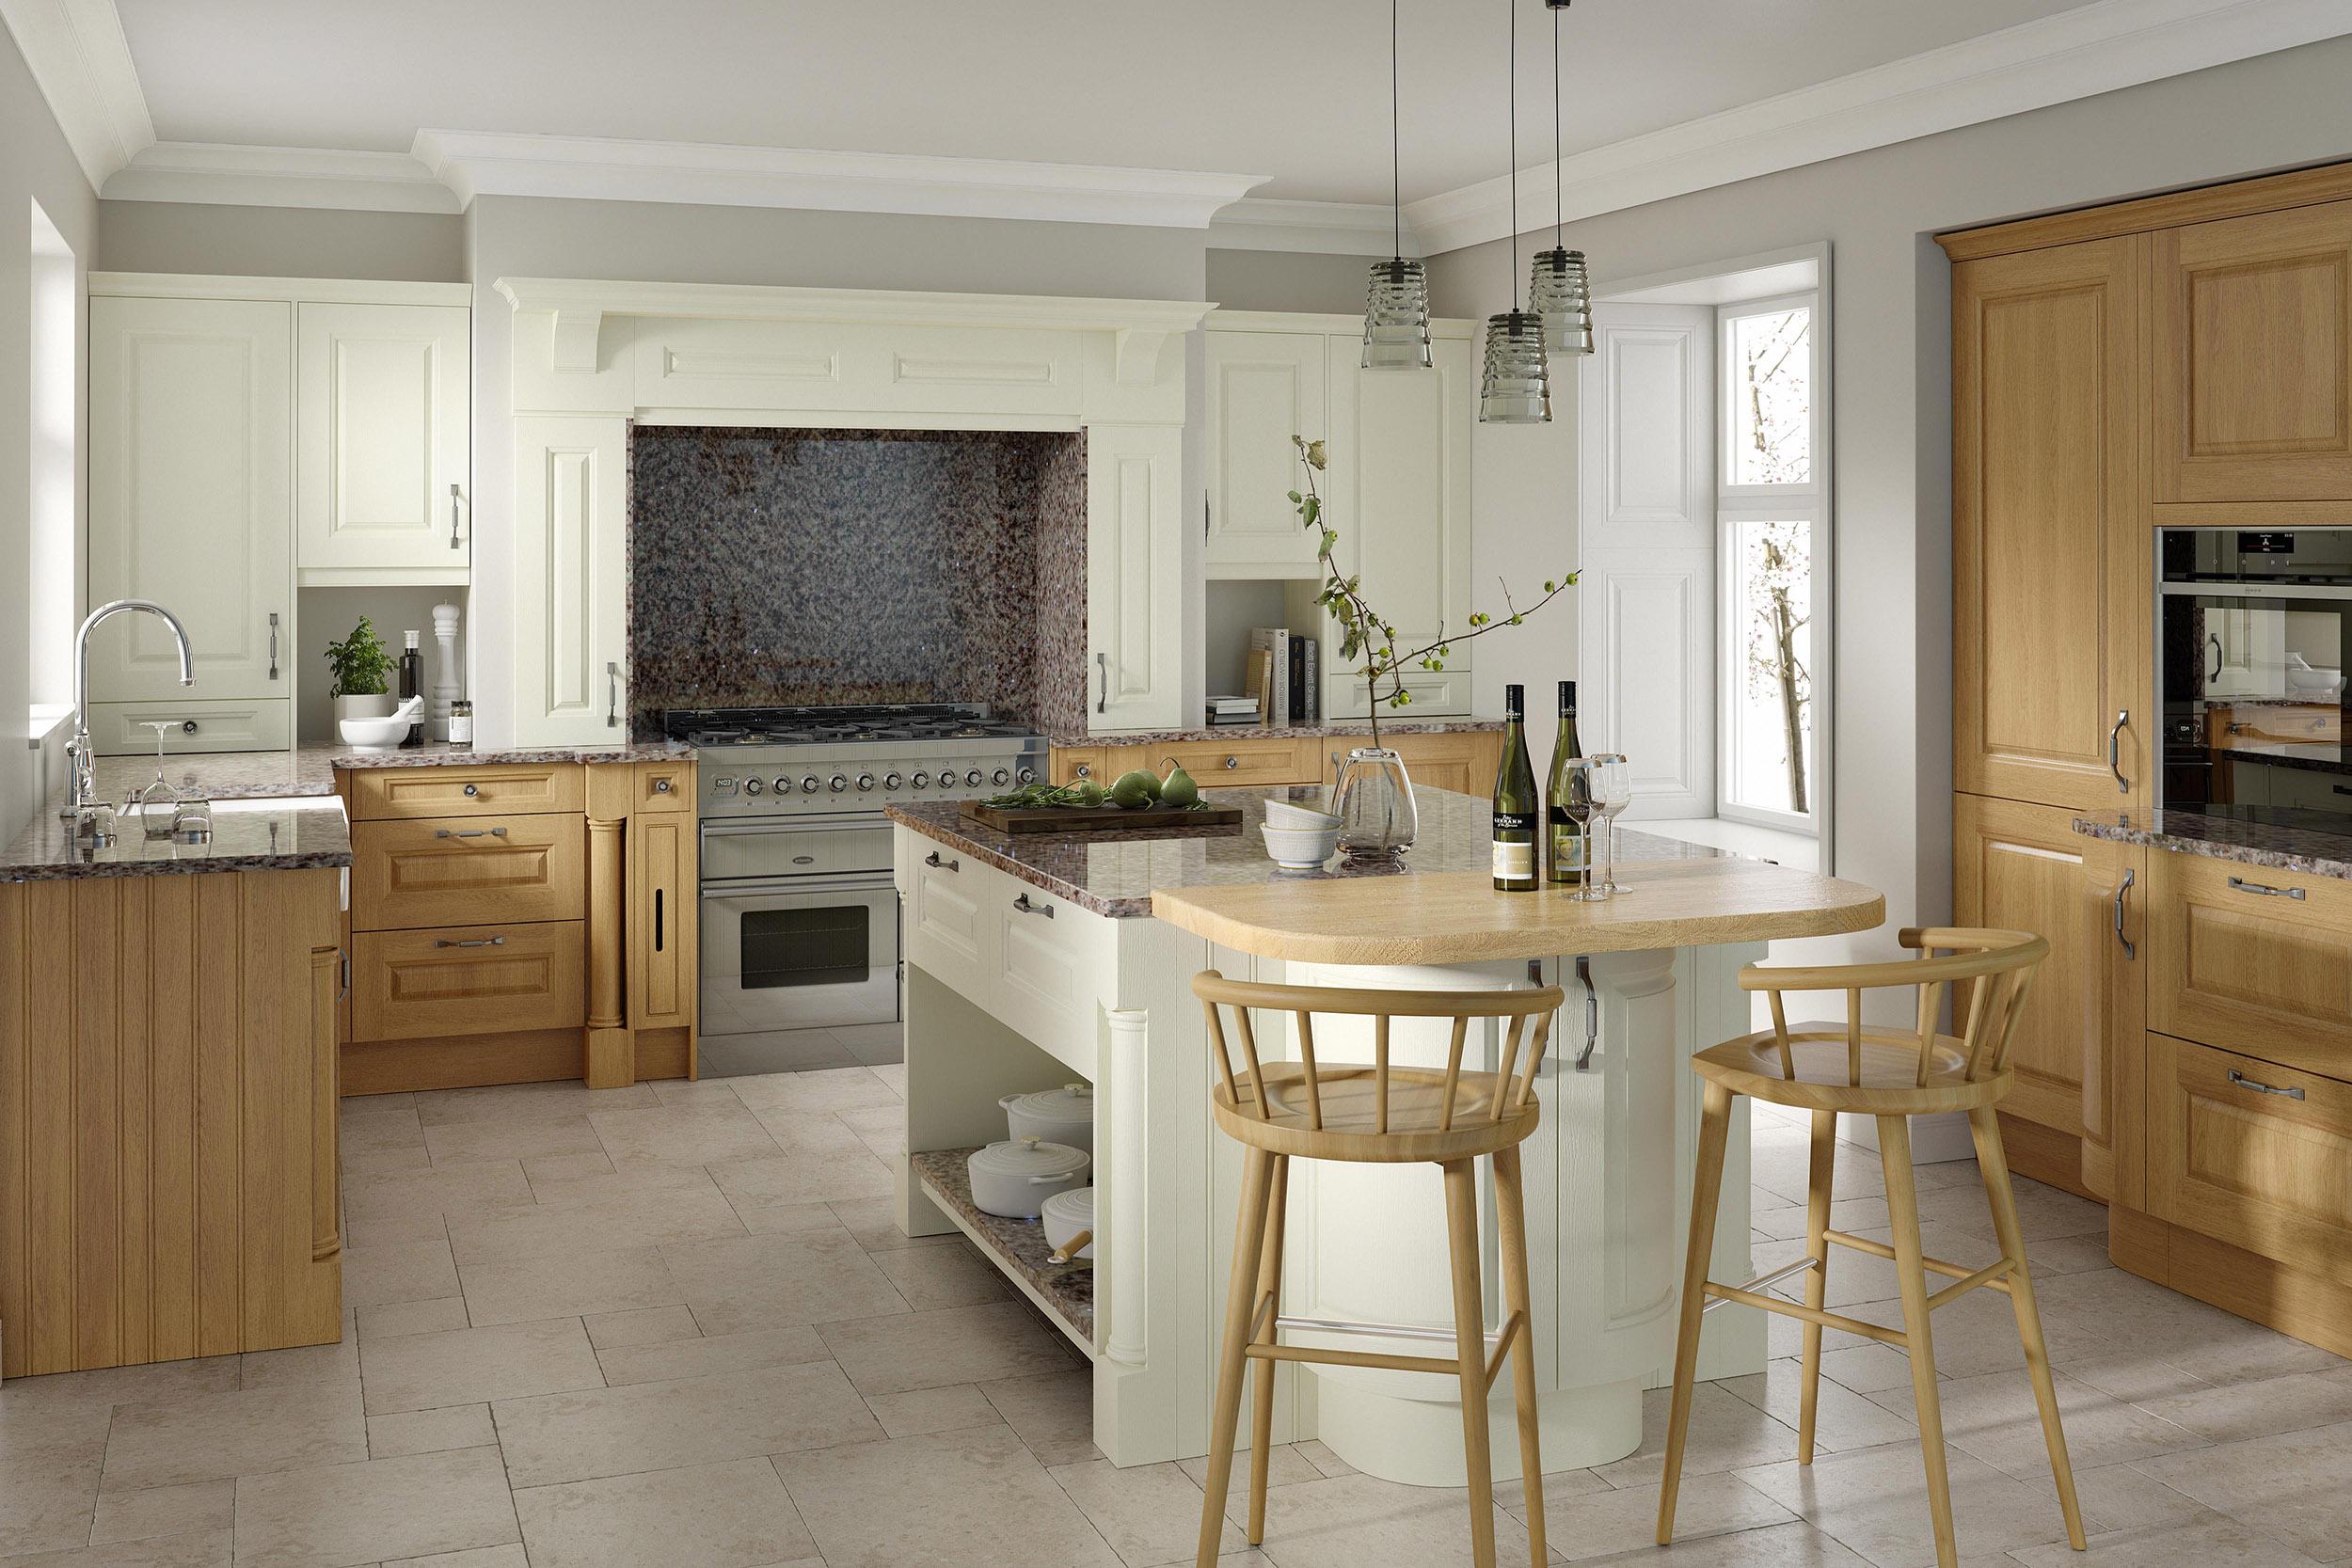 cornell-pendant-lighting-kitchen